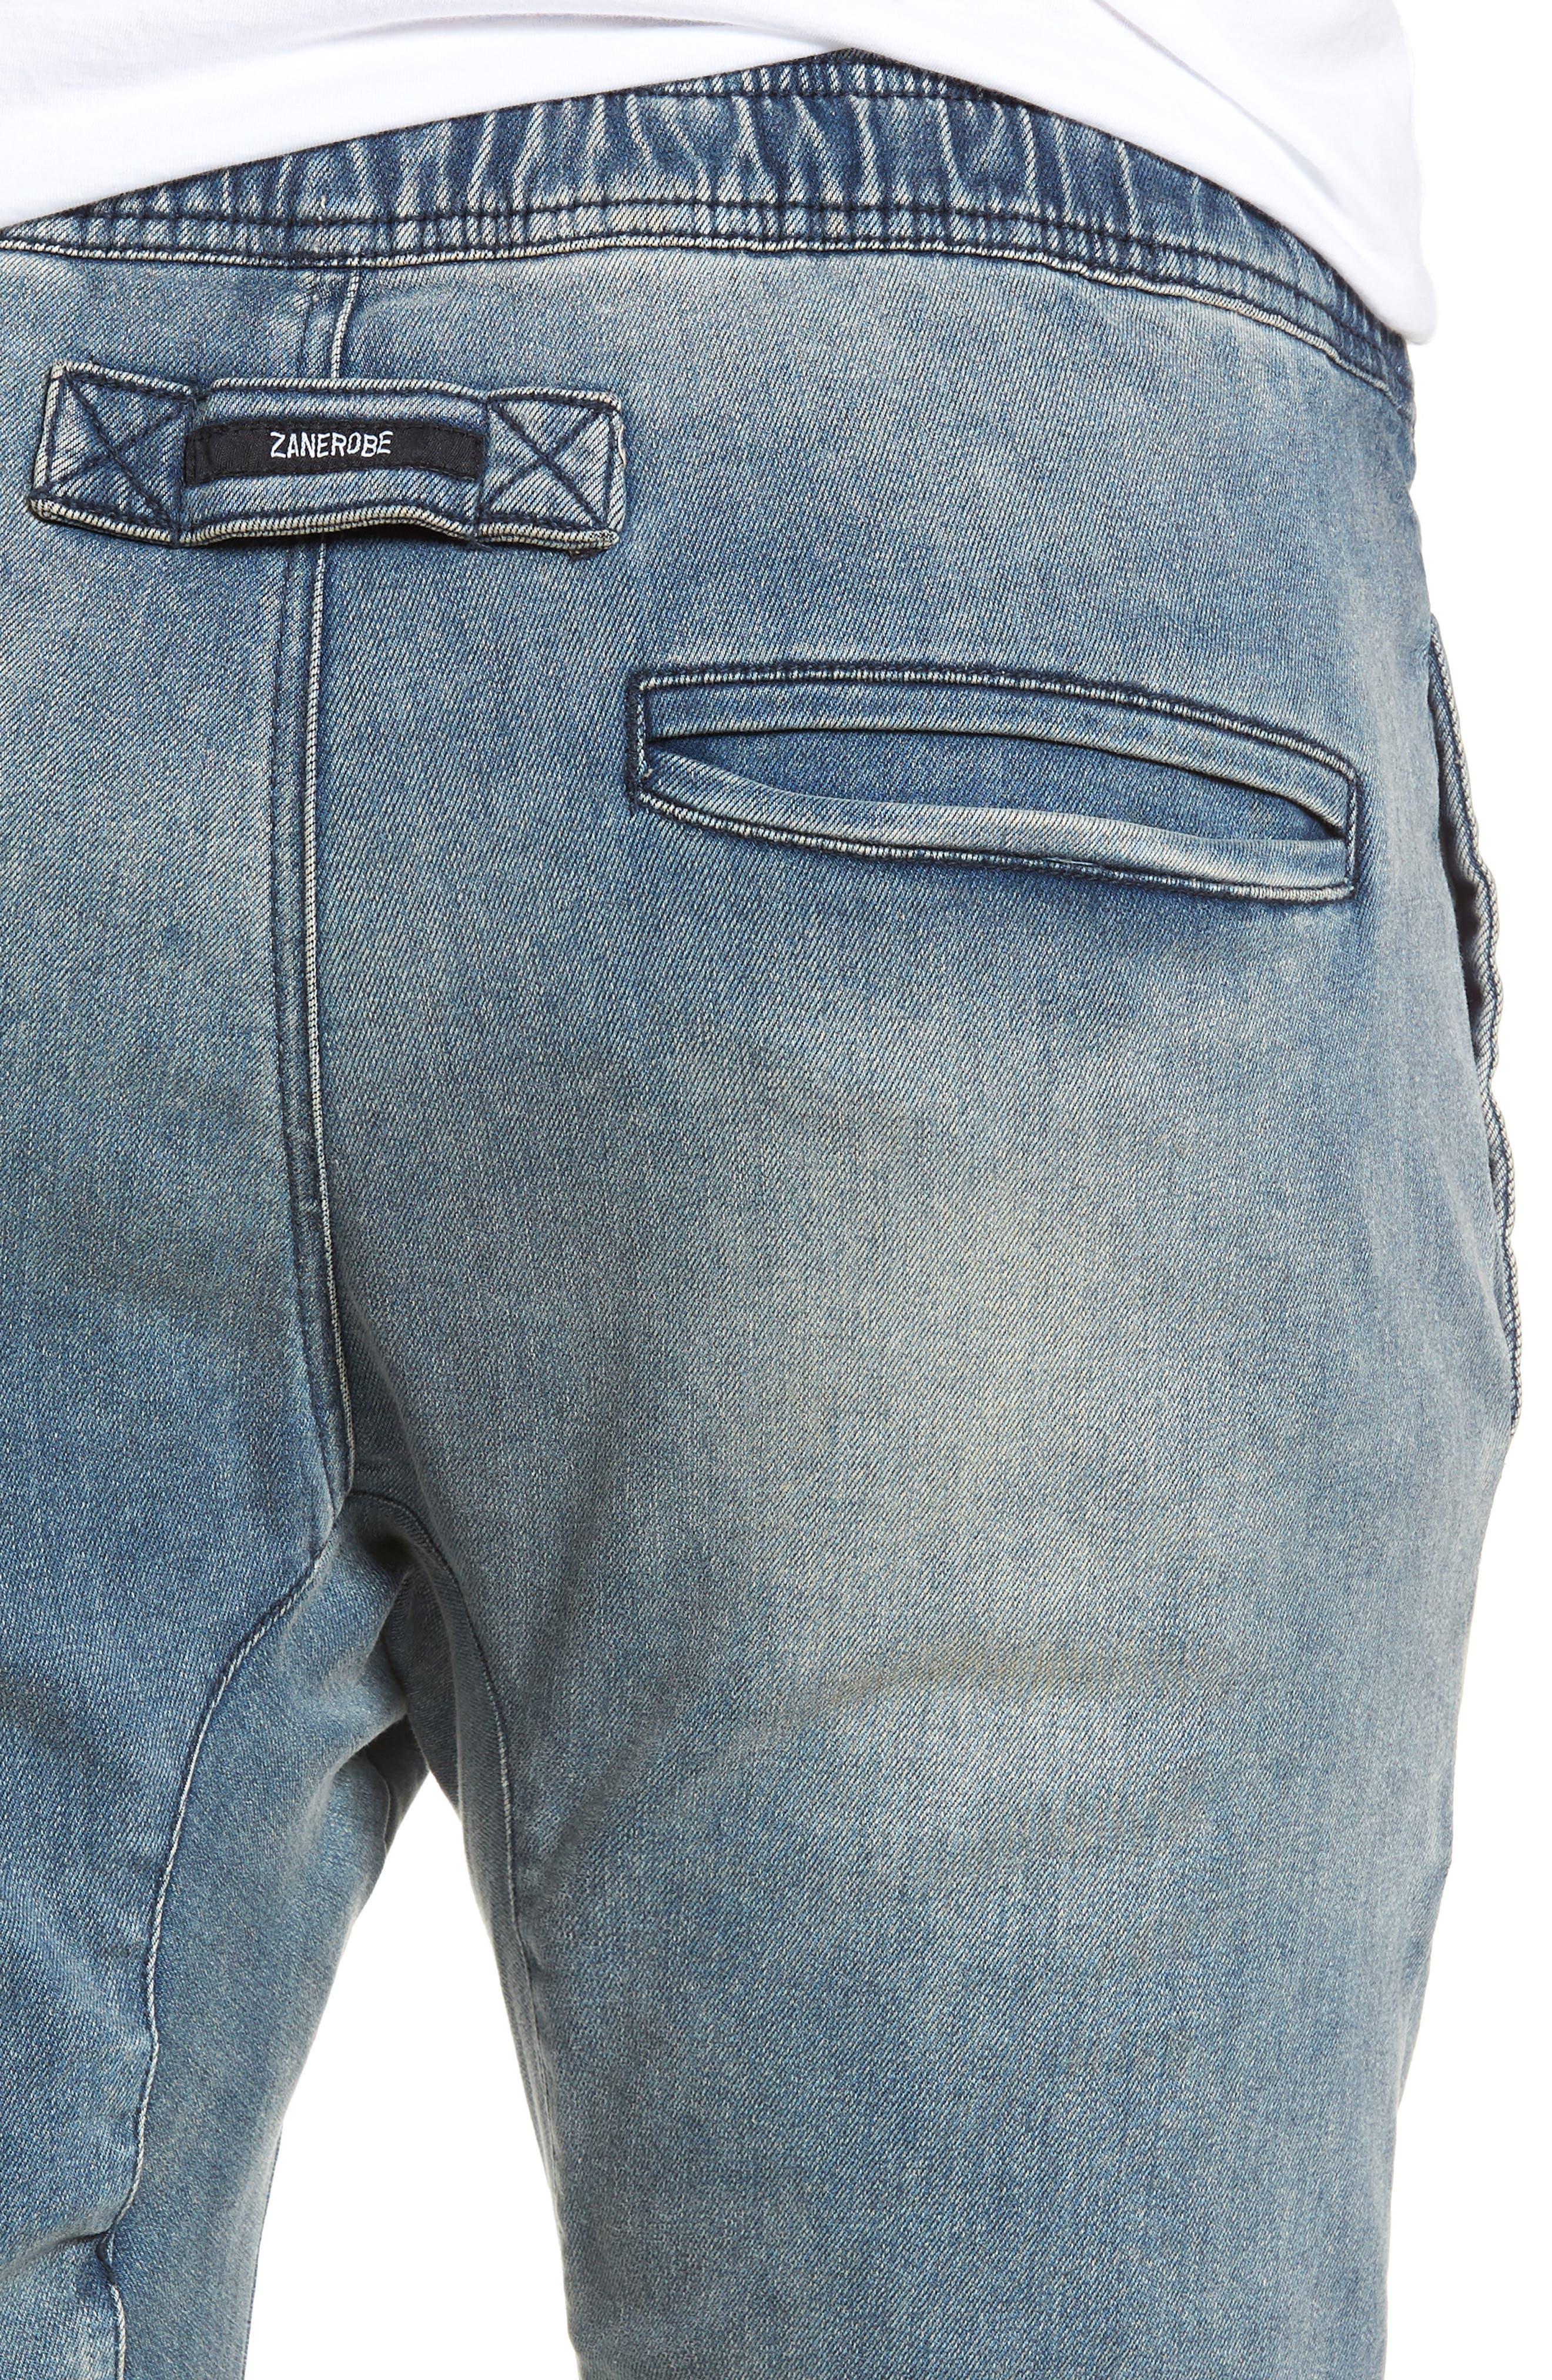 Salerno Flex Jeans,                             Alternate thumbnail 4, color,                             ABANDONED BLUE